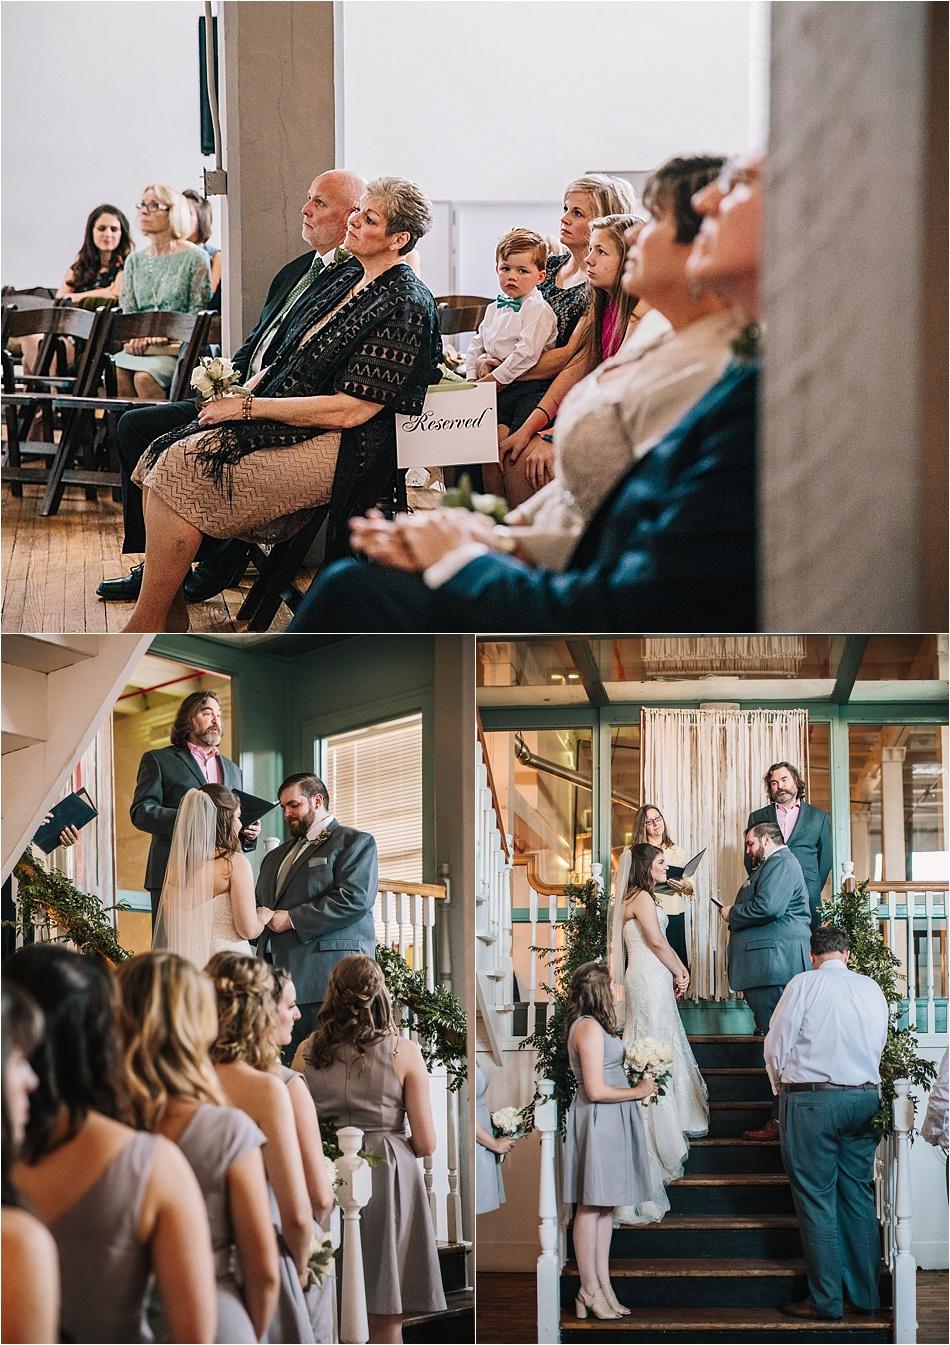 CK-Photo-Nashville-Wedding-Photographer-_0026.jpg